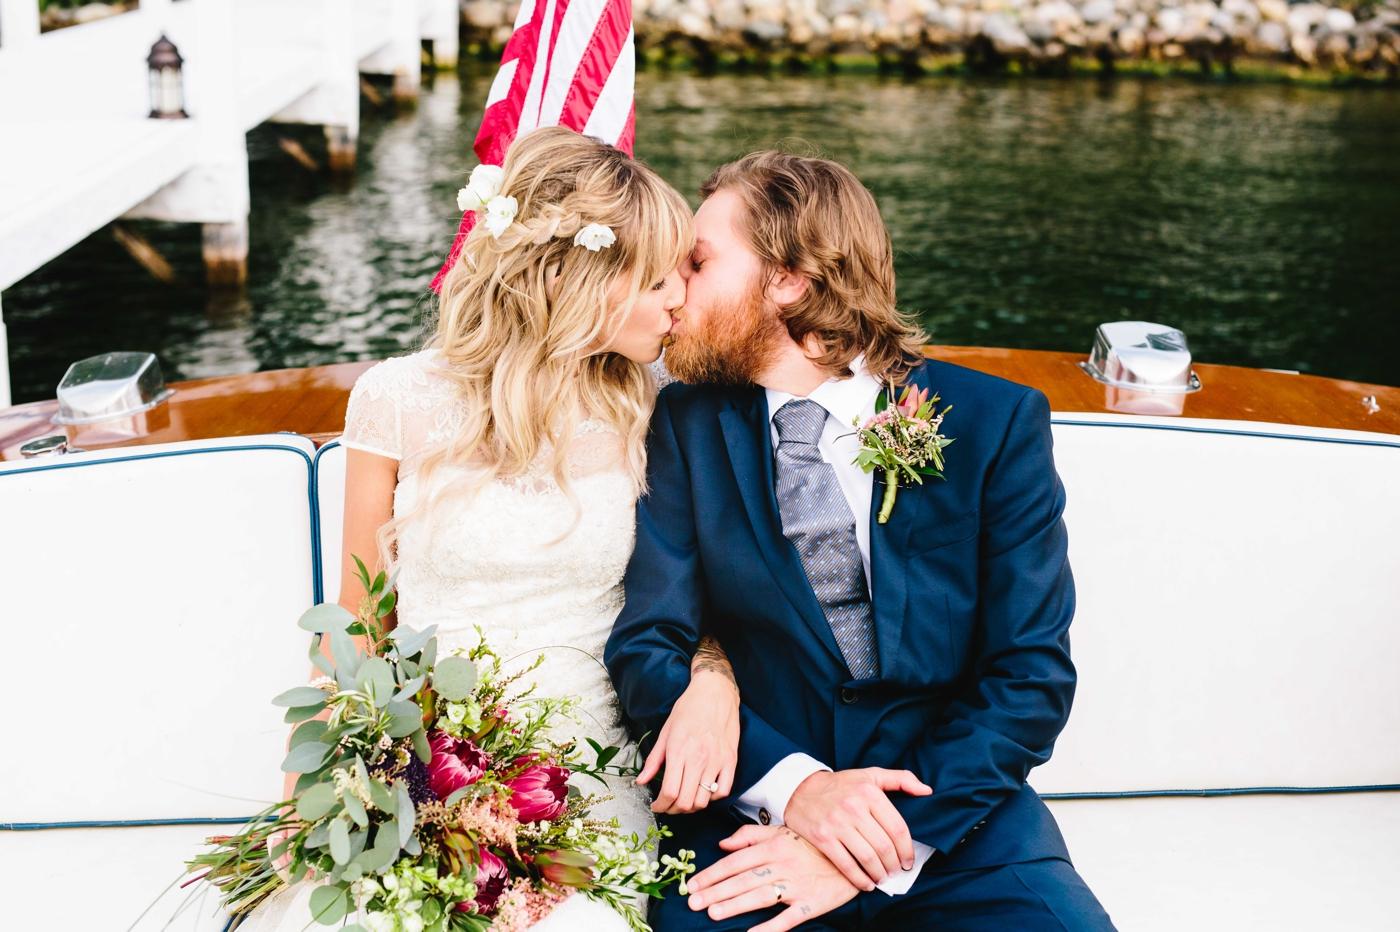 chicago-fine-art-wedding-photography-chriskelsey22